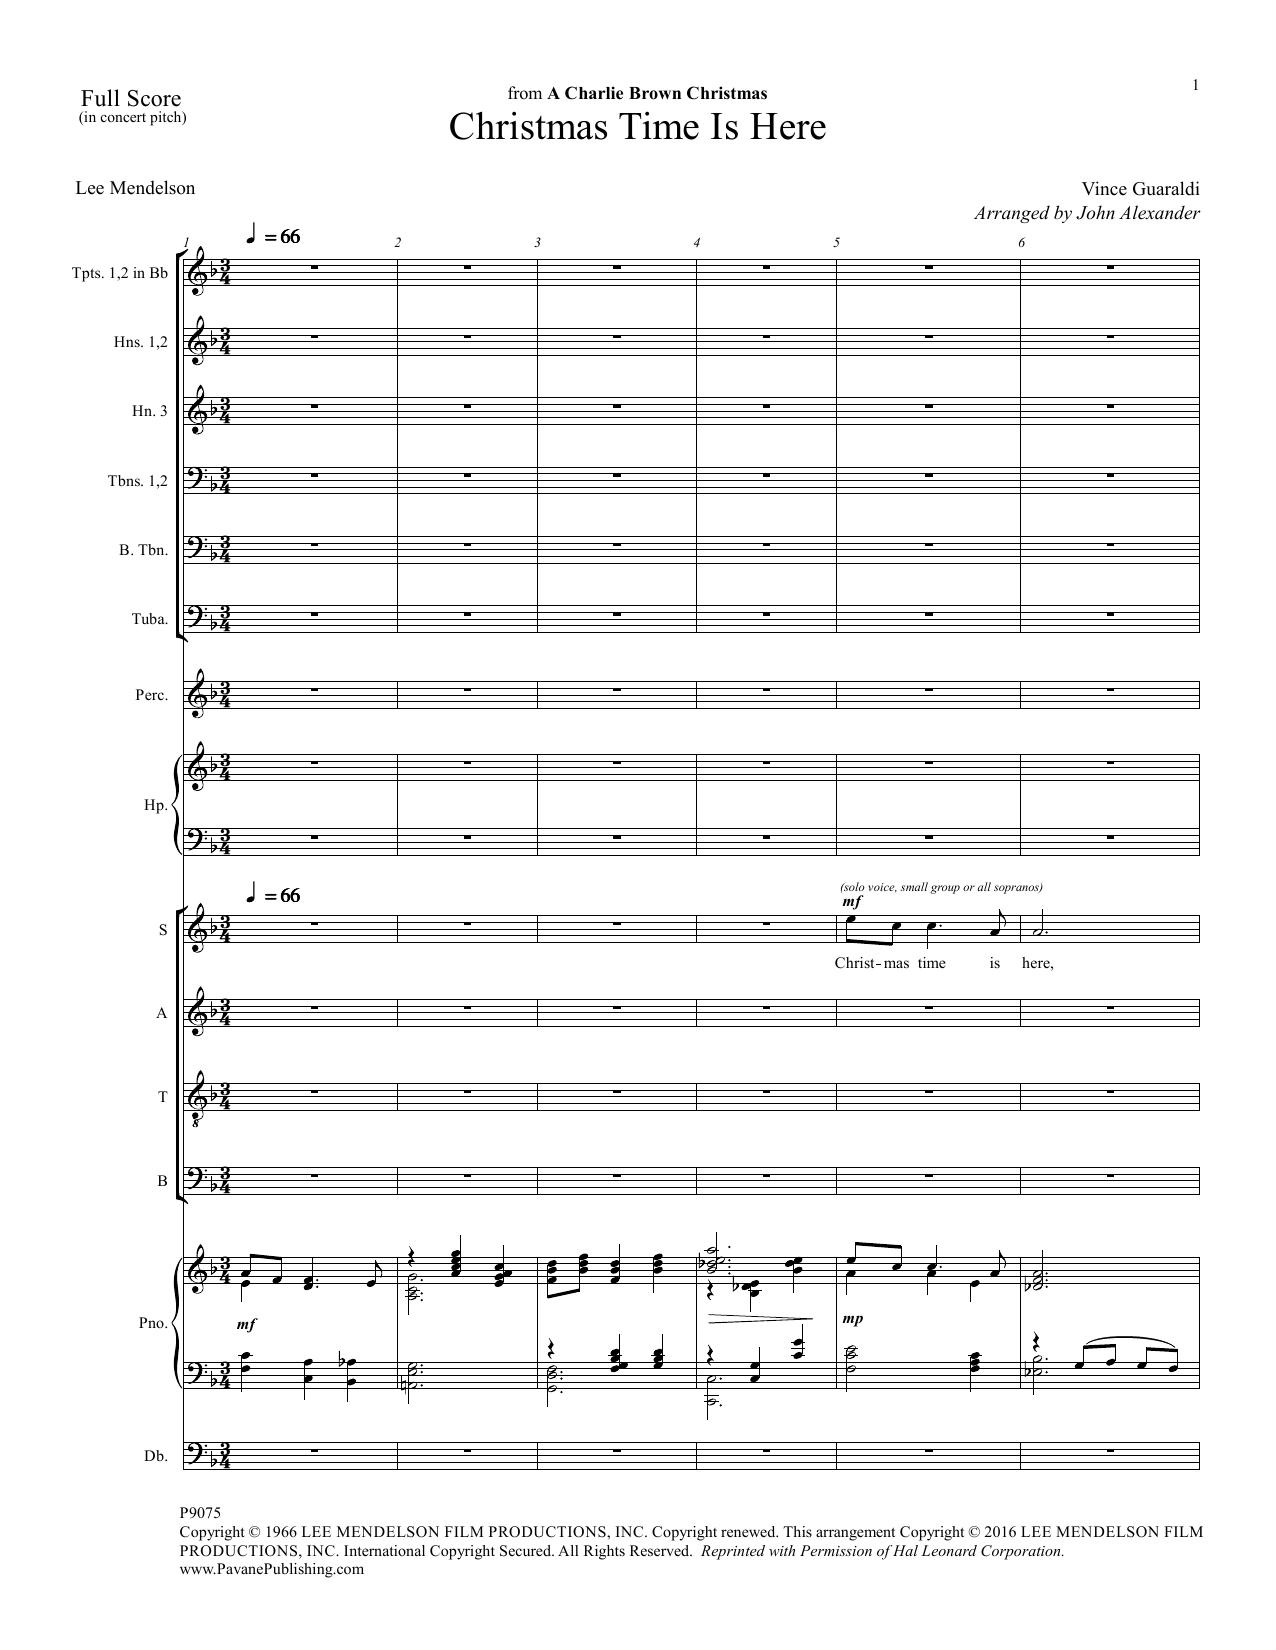 Lee Mendelson - Christmas Time Is Here - Full Score